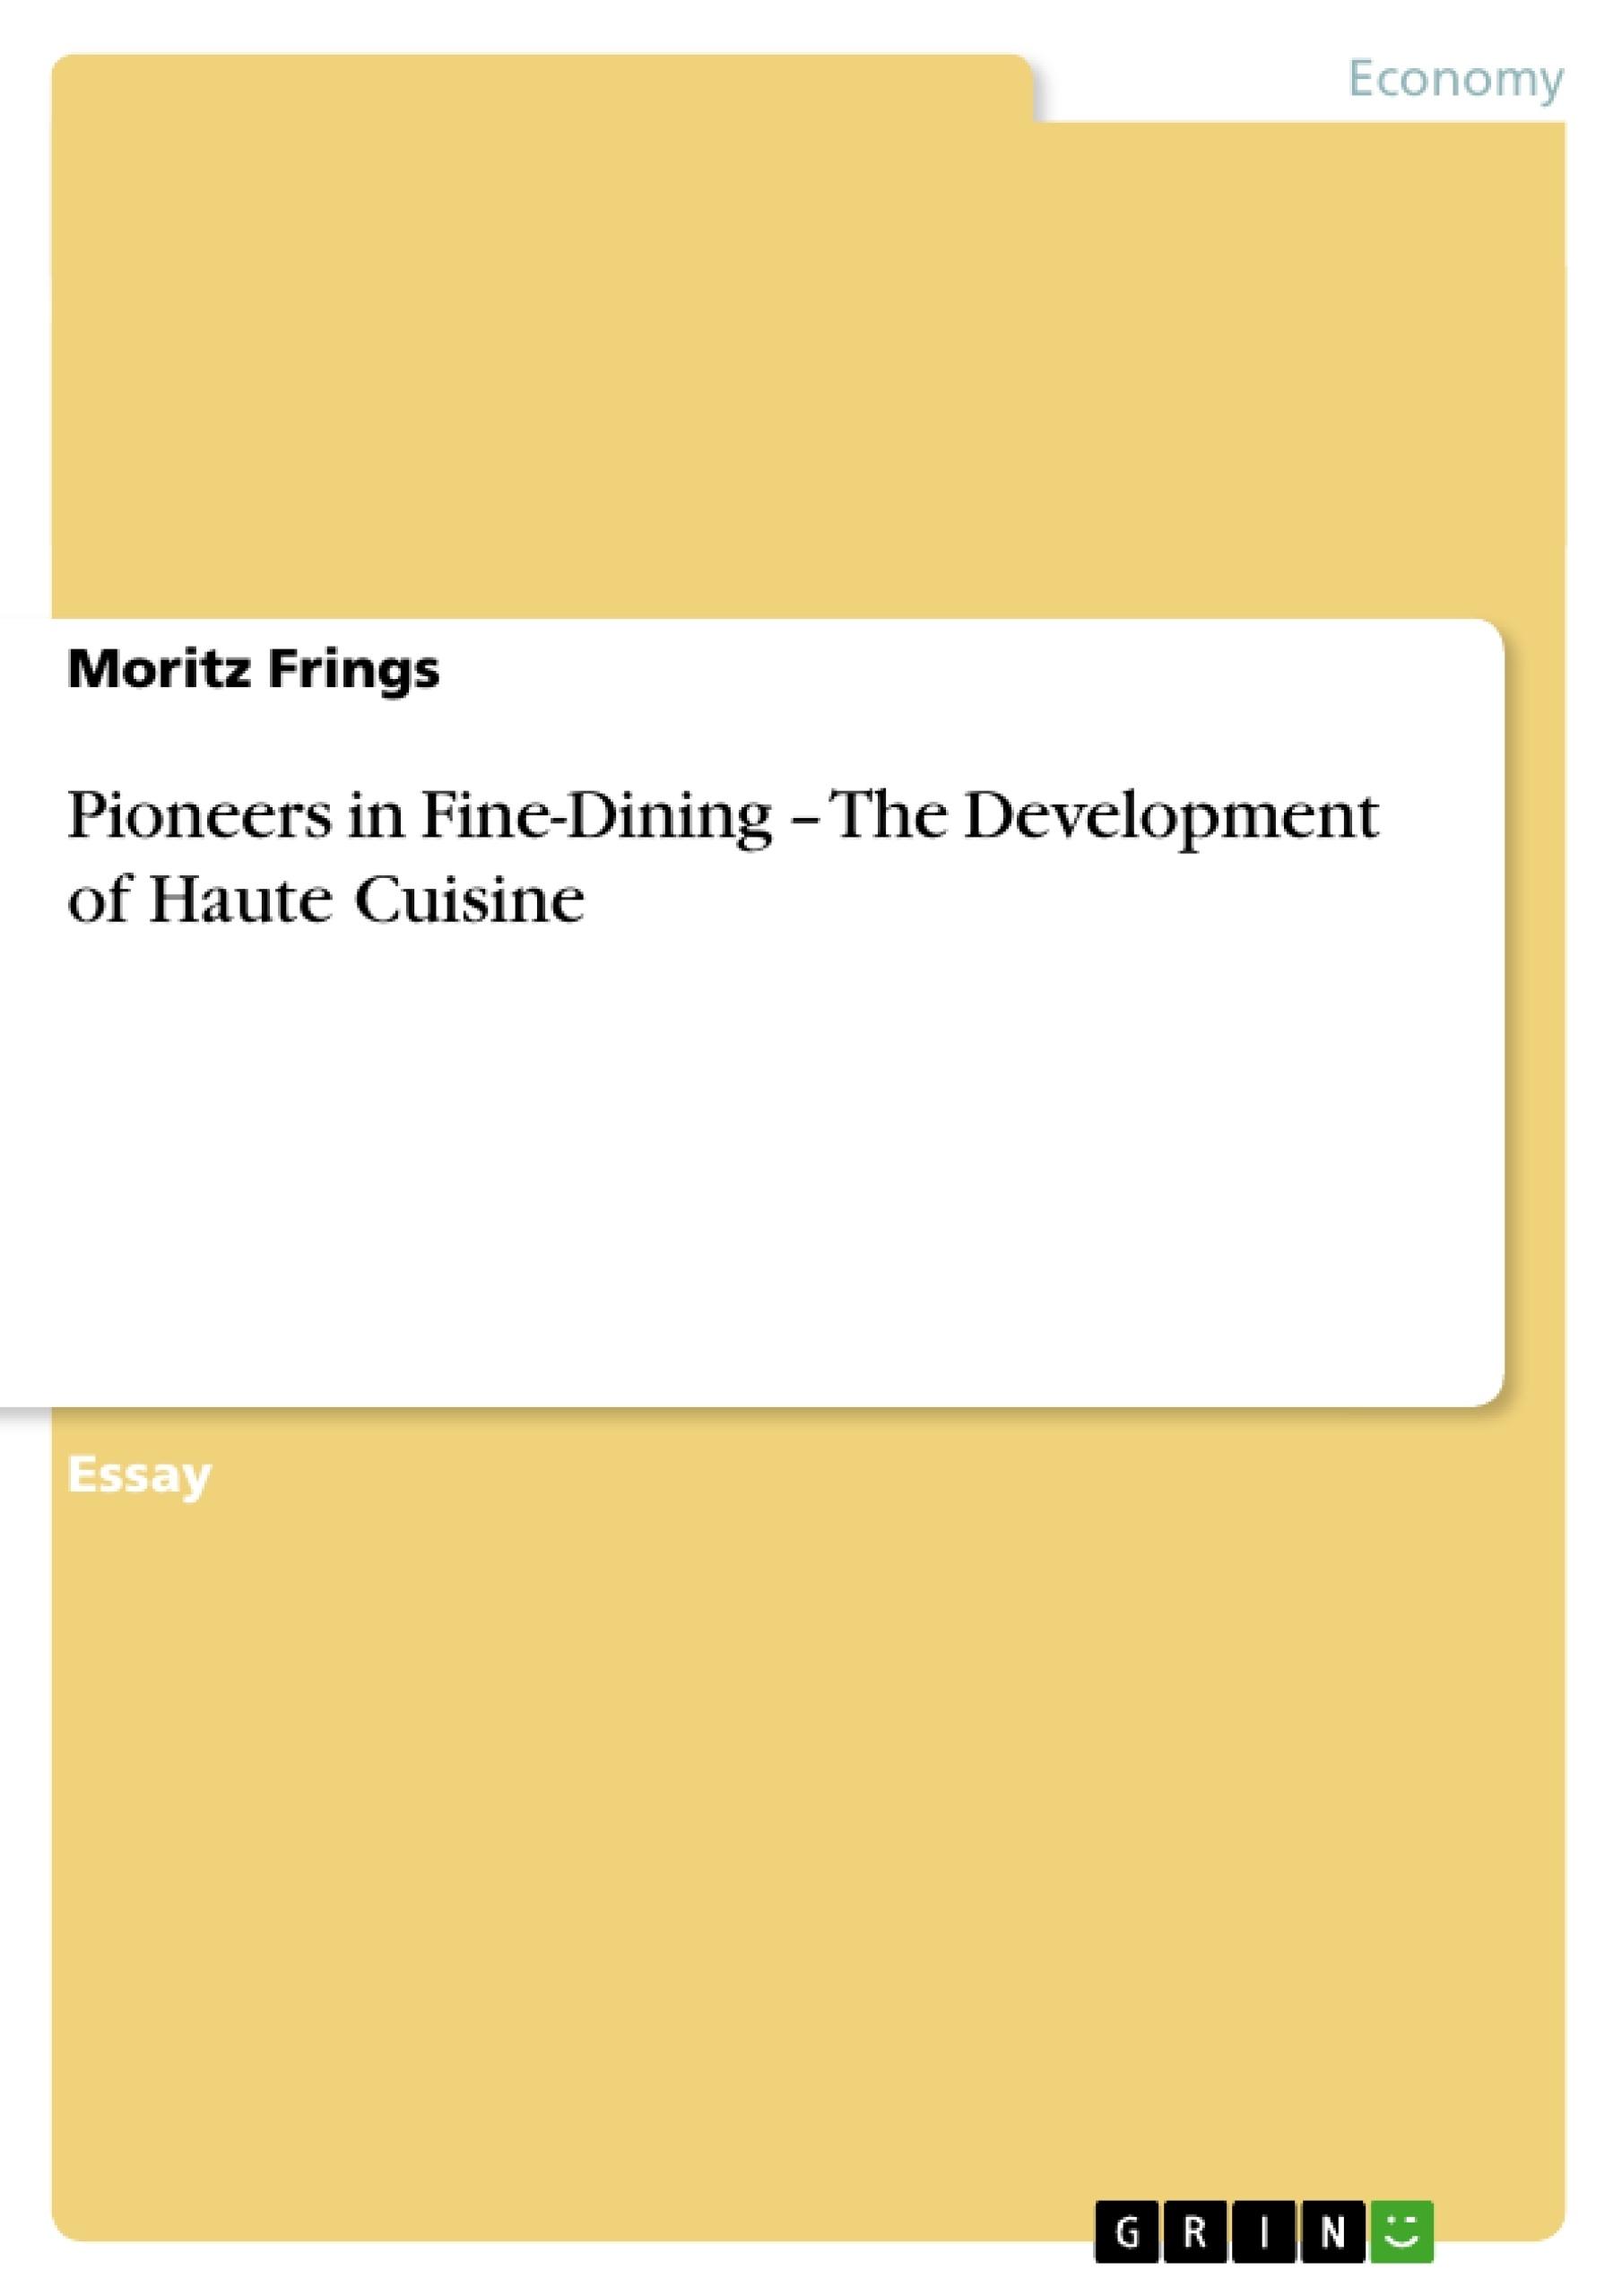 Title: Pioneers in Fine-Dining – The Development of Haute Cuisine